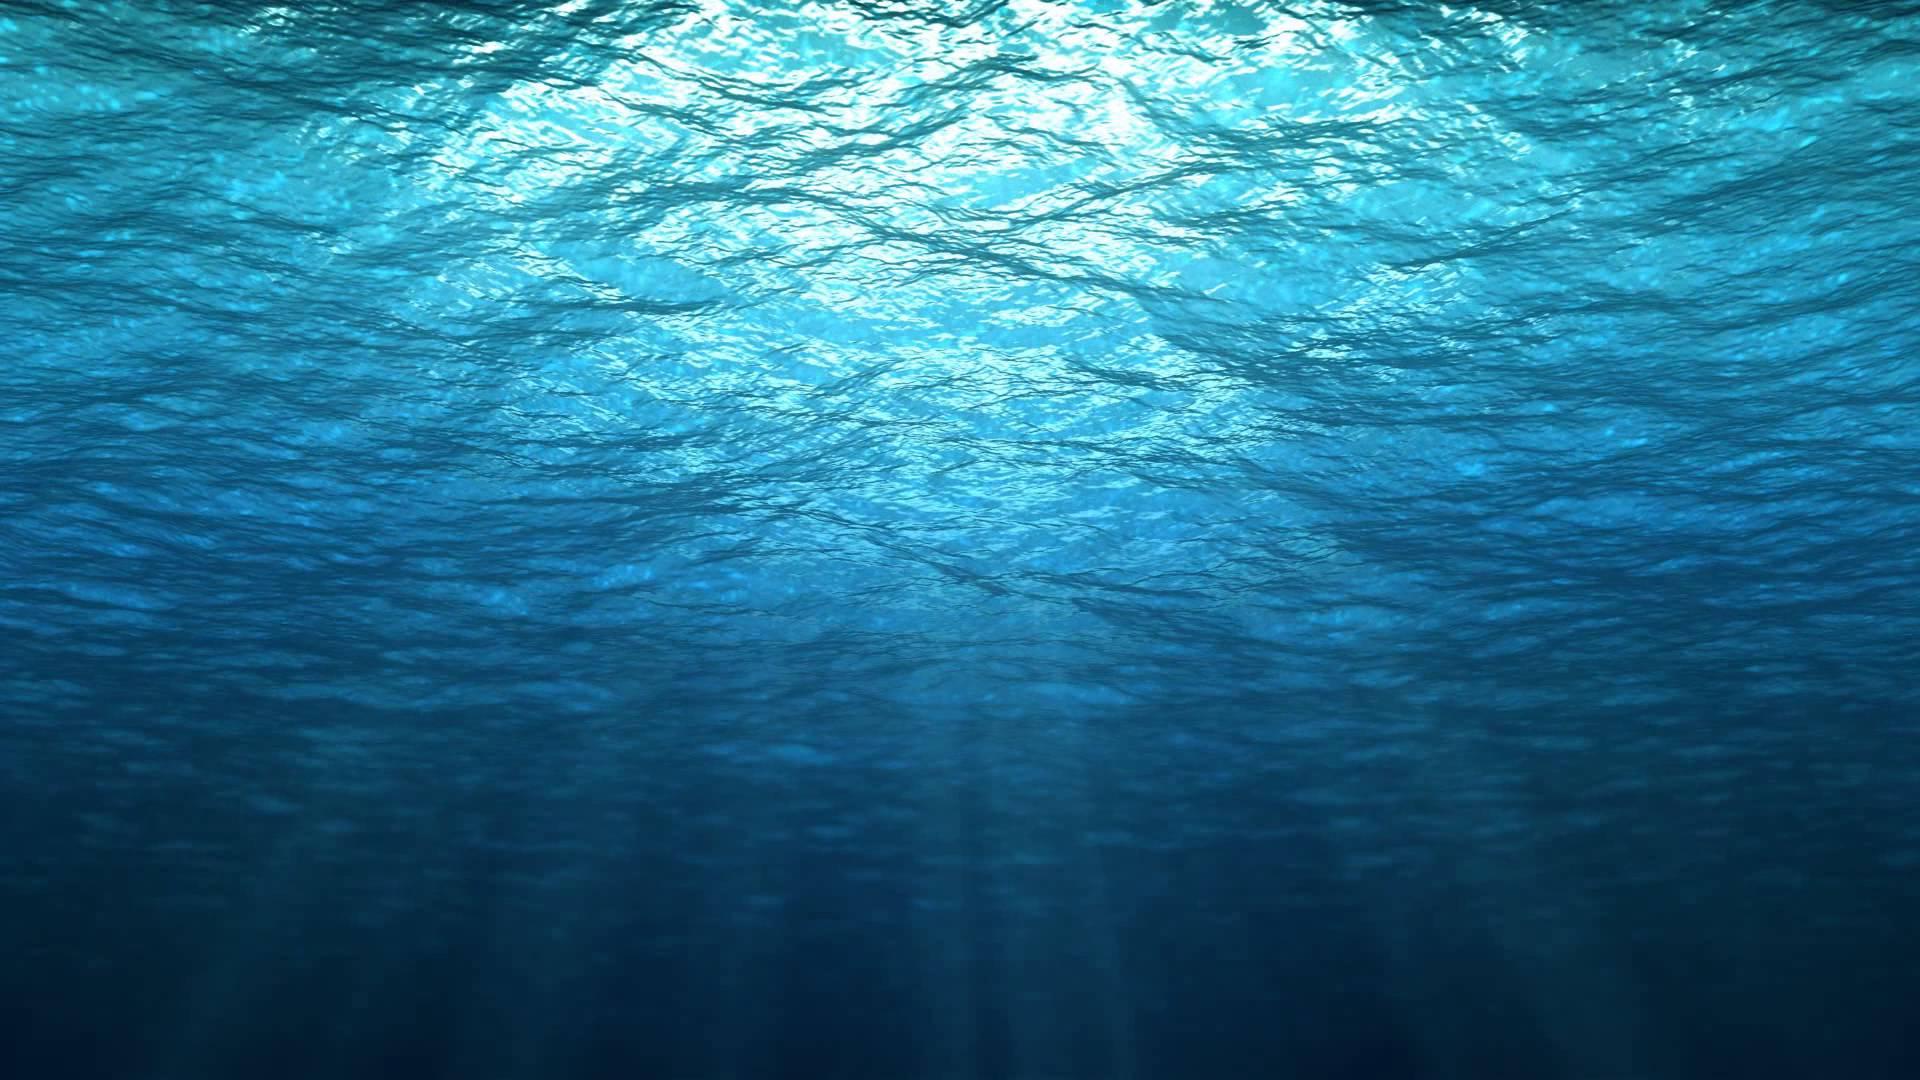 Underwater 4k Wallpaper Deep Sea 414547 Hd Wallpaper